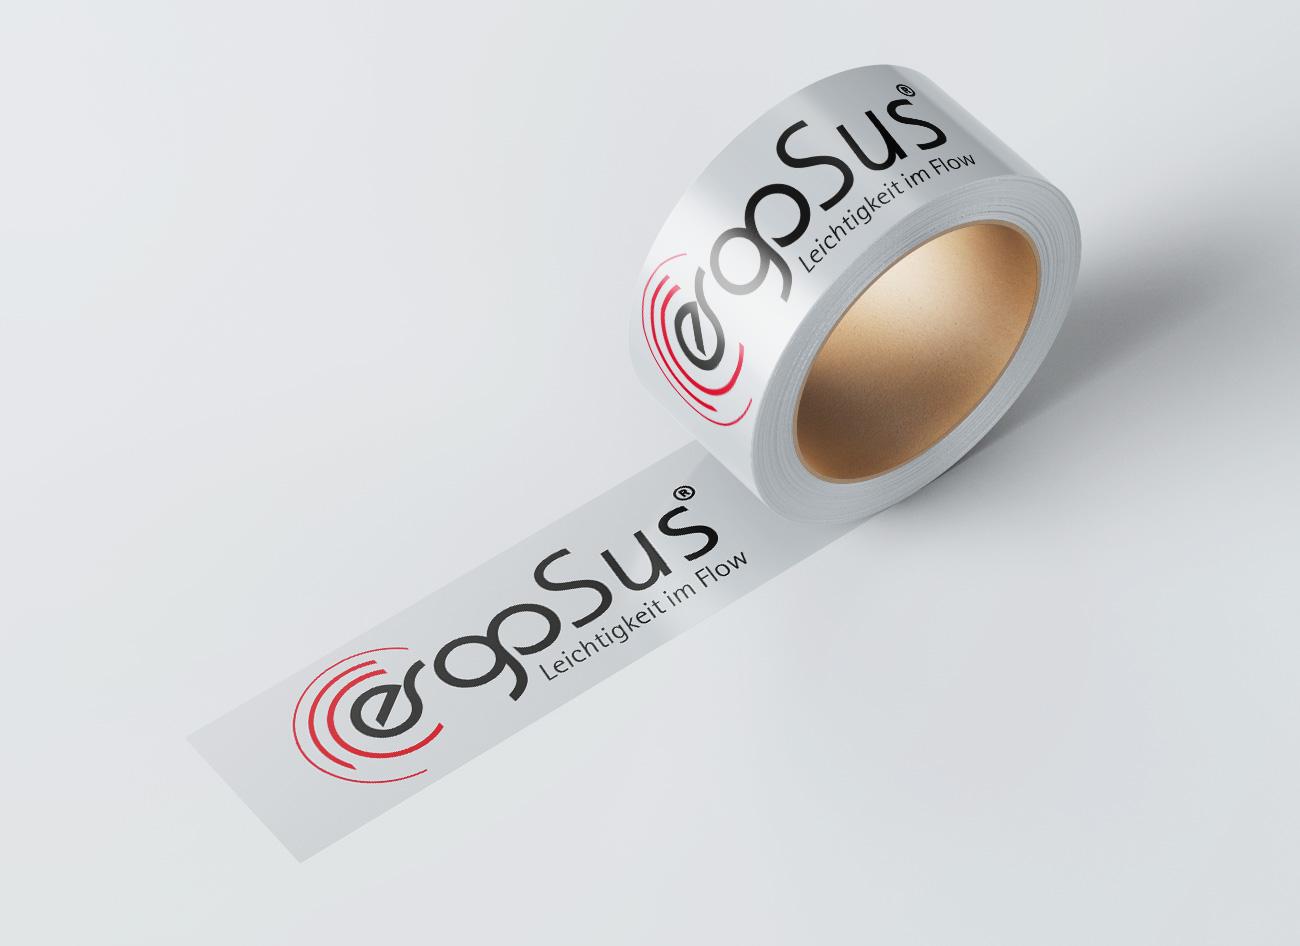 Pernet Design x ErgoSs GmbH Ductape